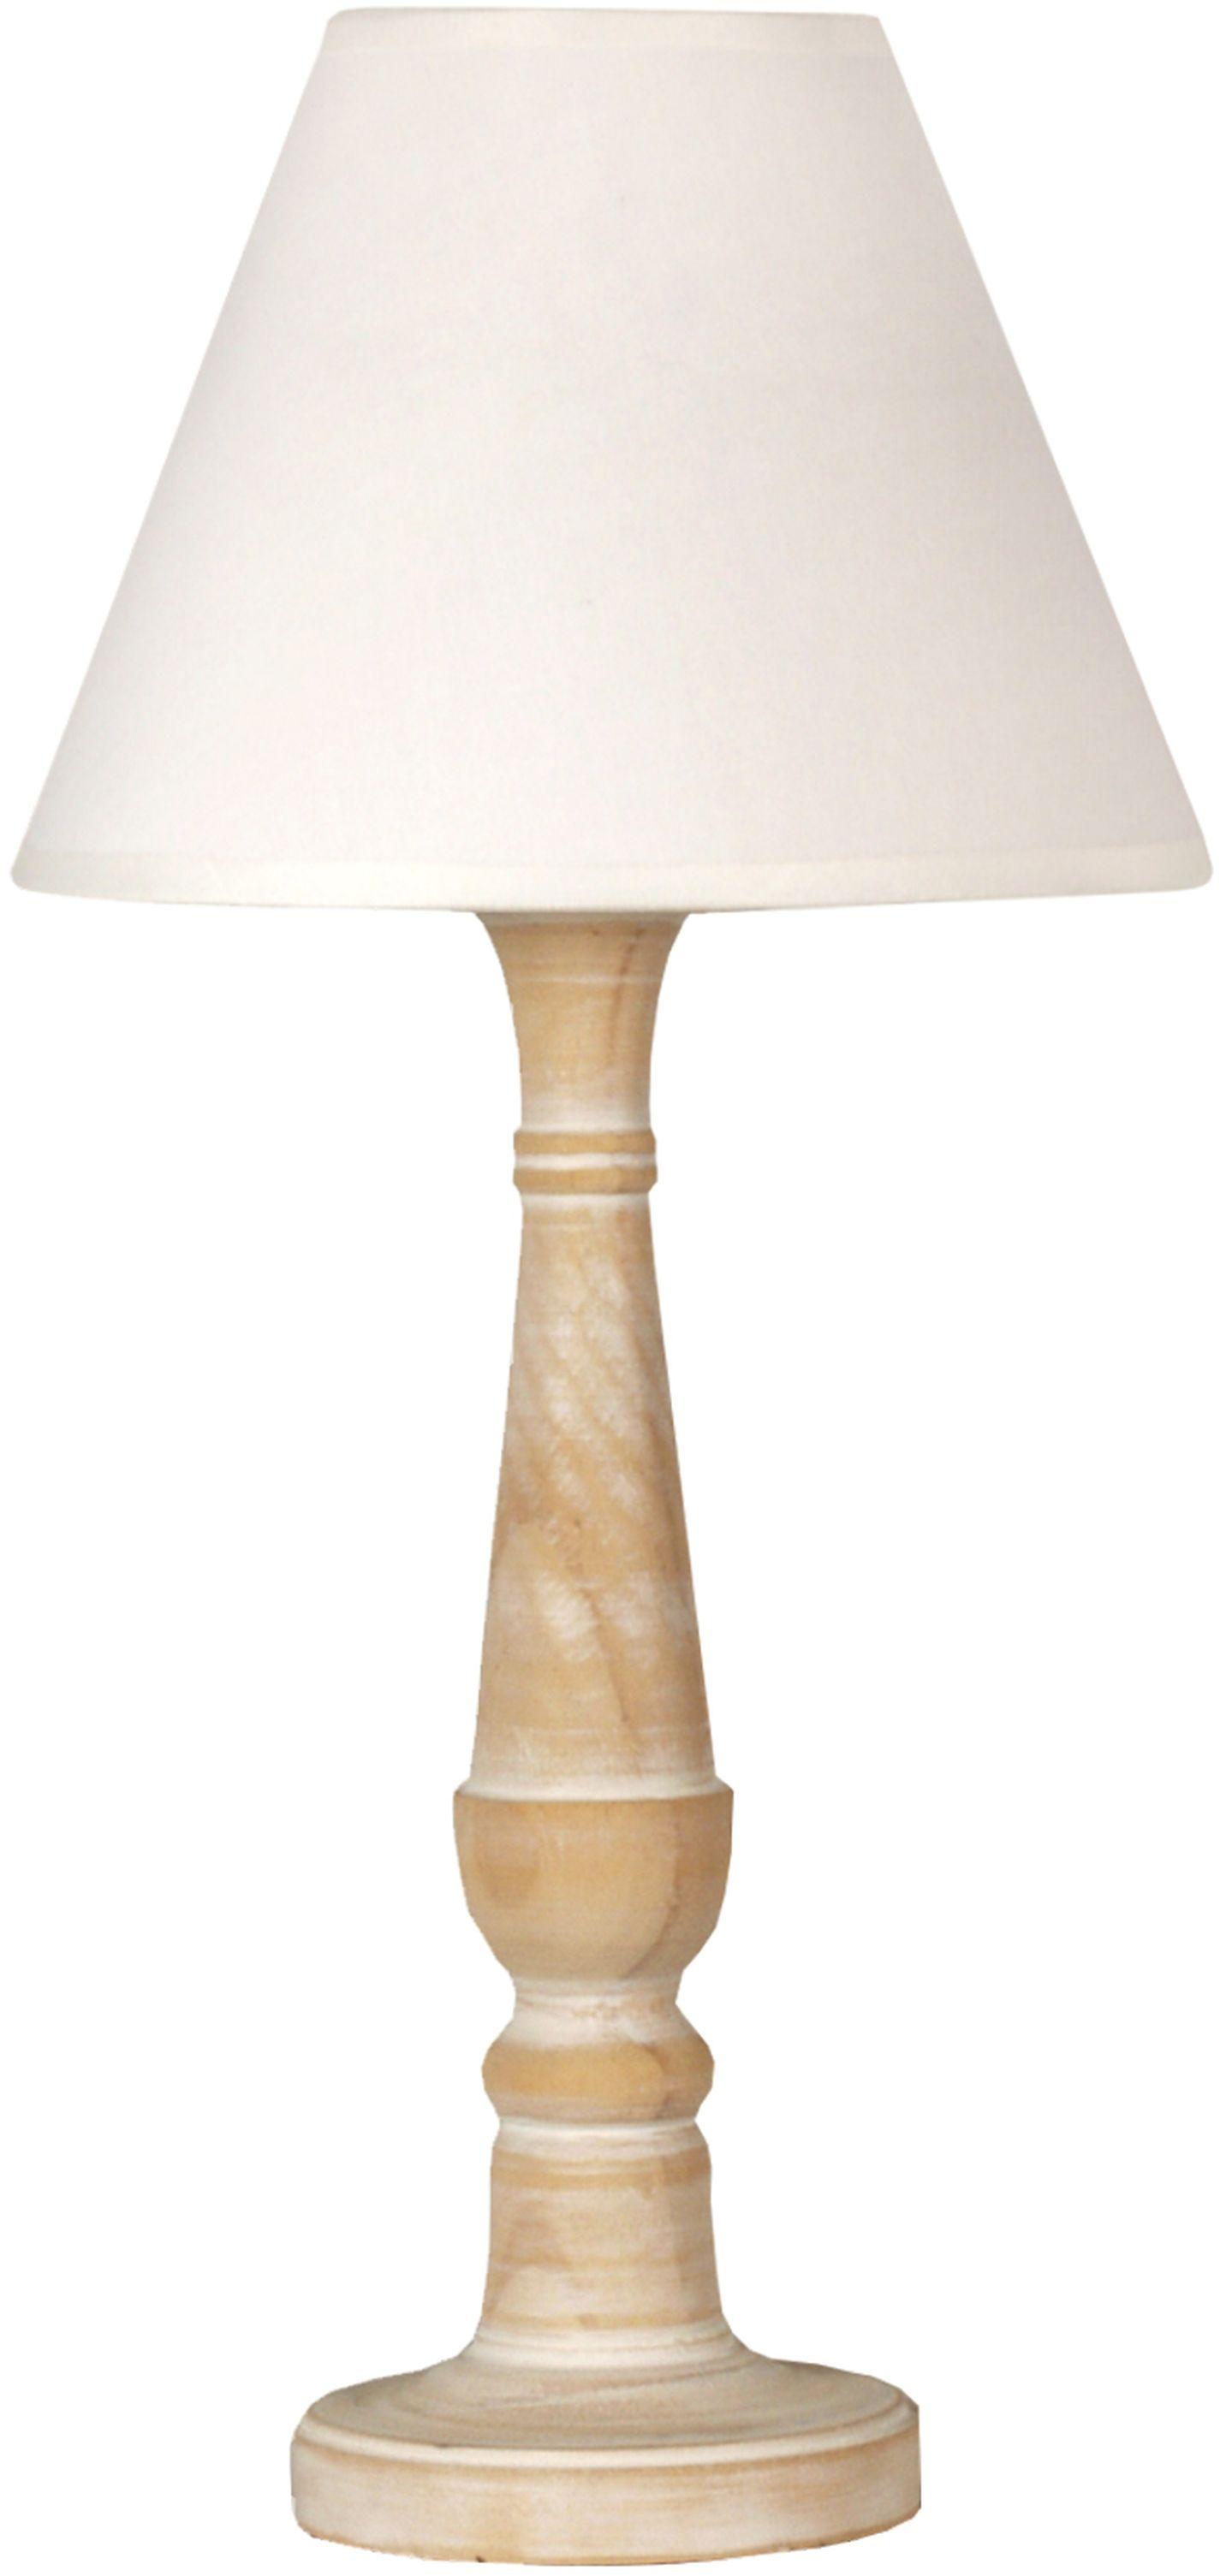 Candellux FOLCLORE 1 41-80724 lampa stołowa abażur biała 1X40W E14 20 cm